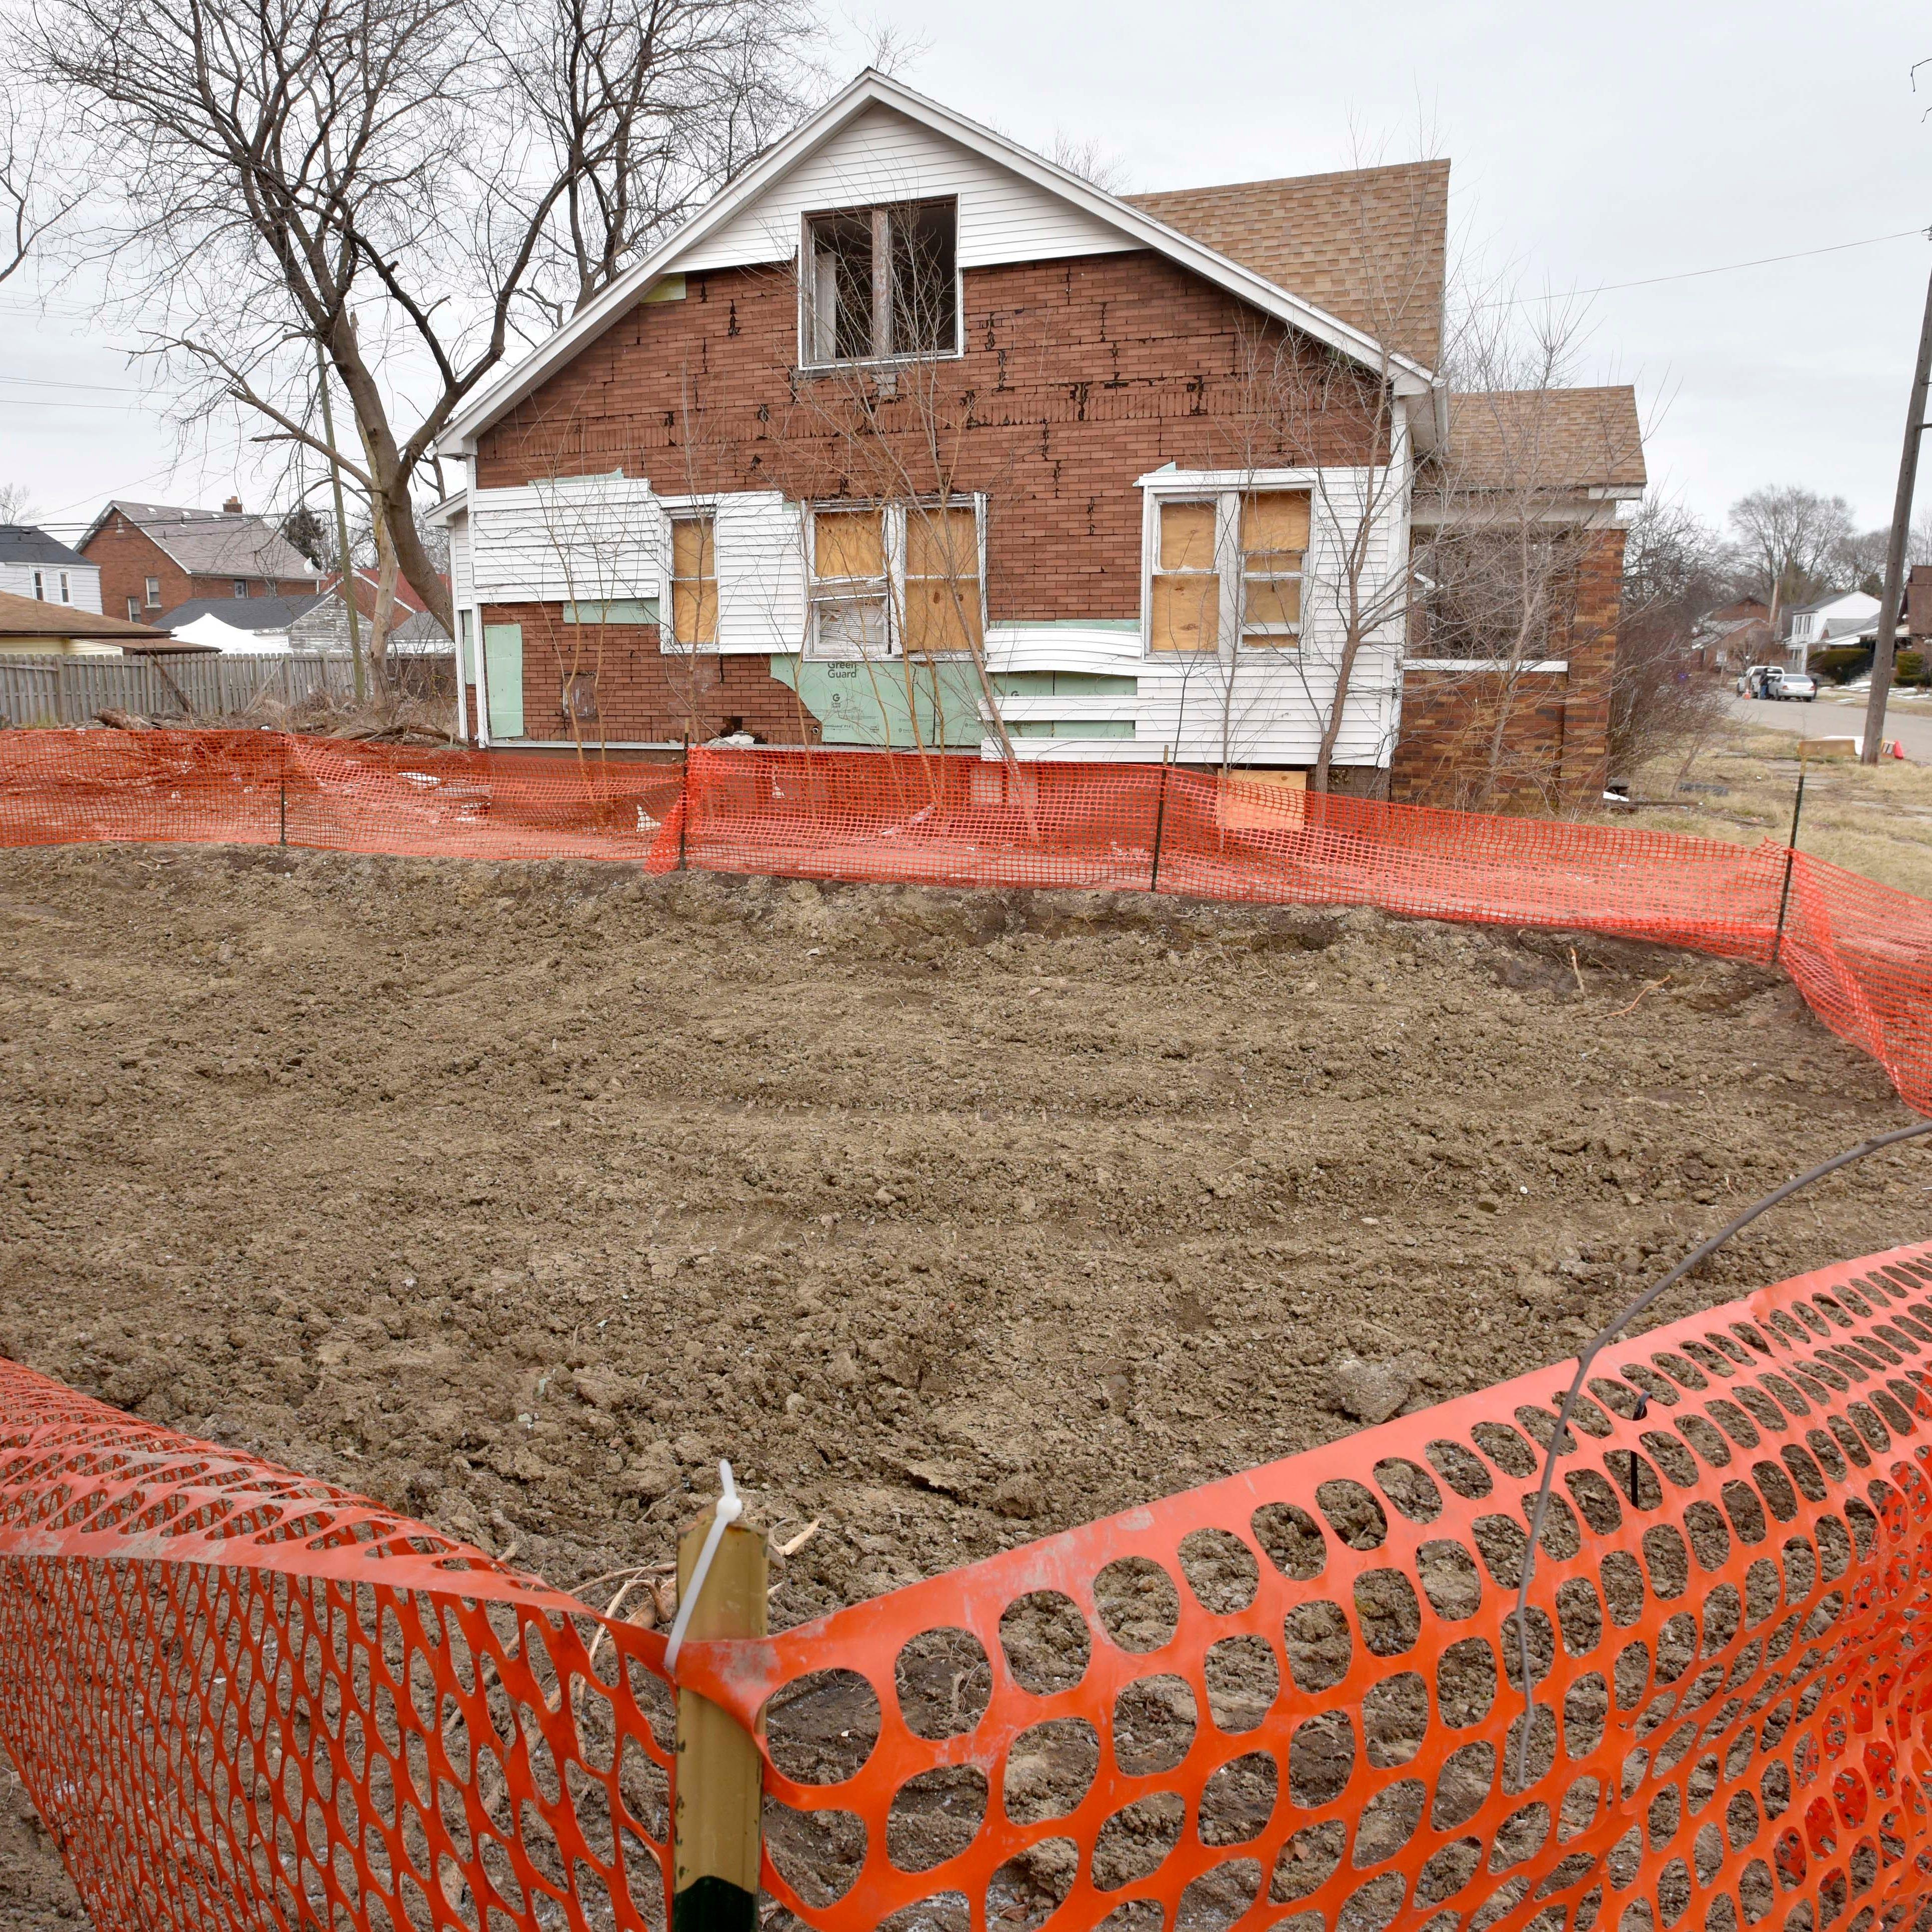 Contractor accused of leaving debris in Detroit demo dirt